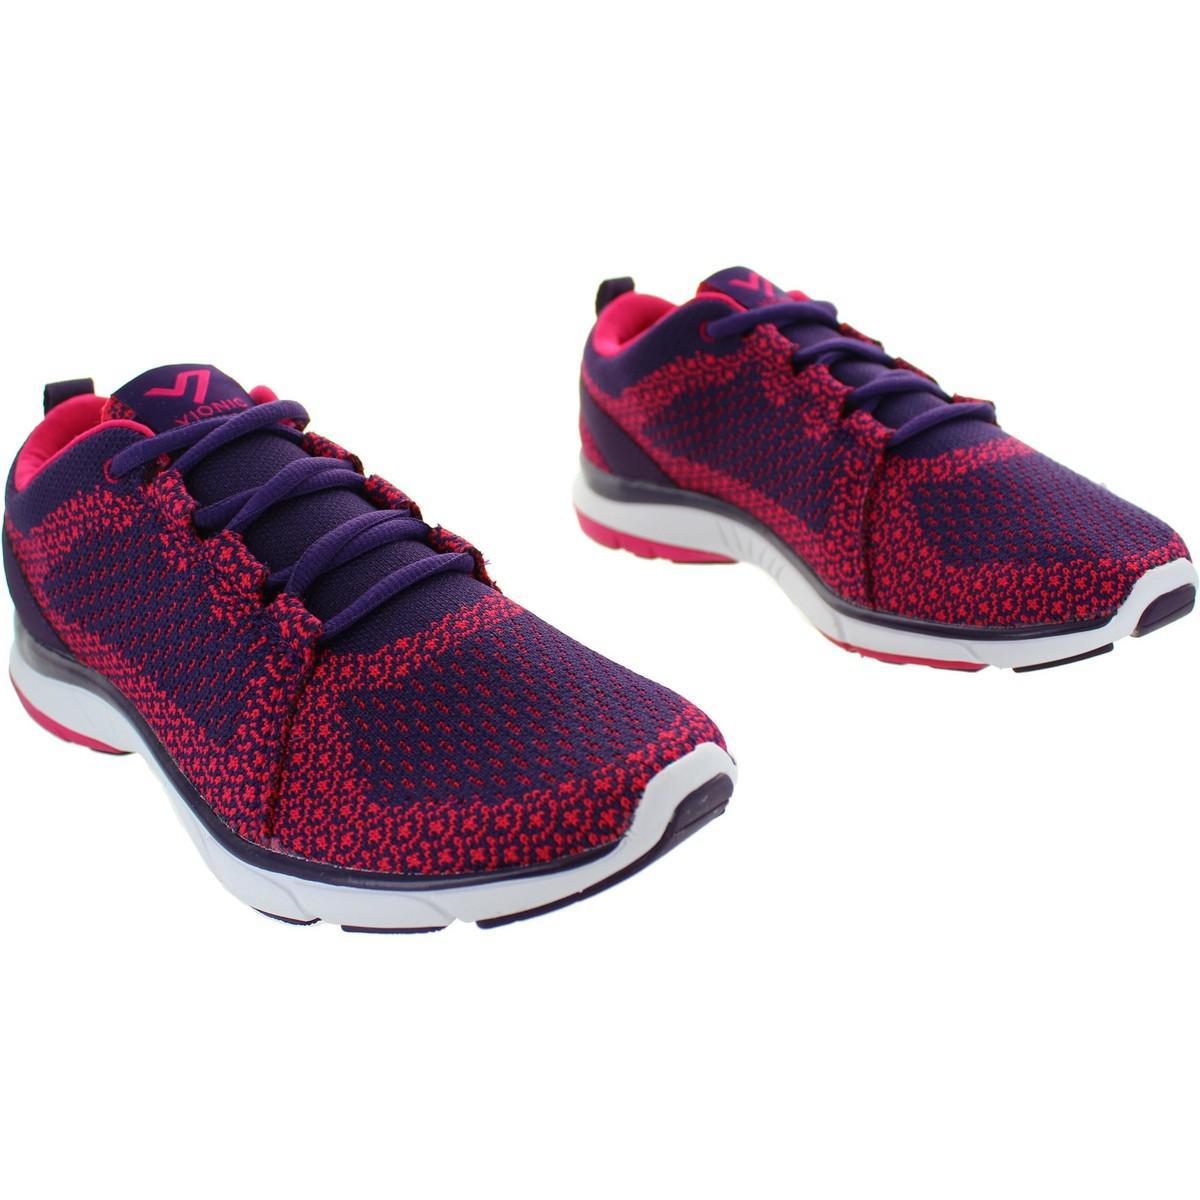 Cheap Sale Amazon Vionic Flex Sierra women's Shoes (Trainers) in Find Great Sale Online Outlet 2018 Unisex Buy Cheap Get Authentic Footlocker Pictures For Sale 4qFw2